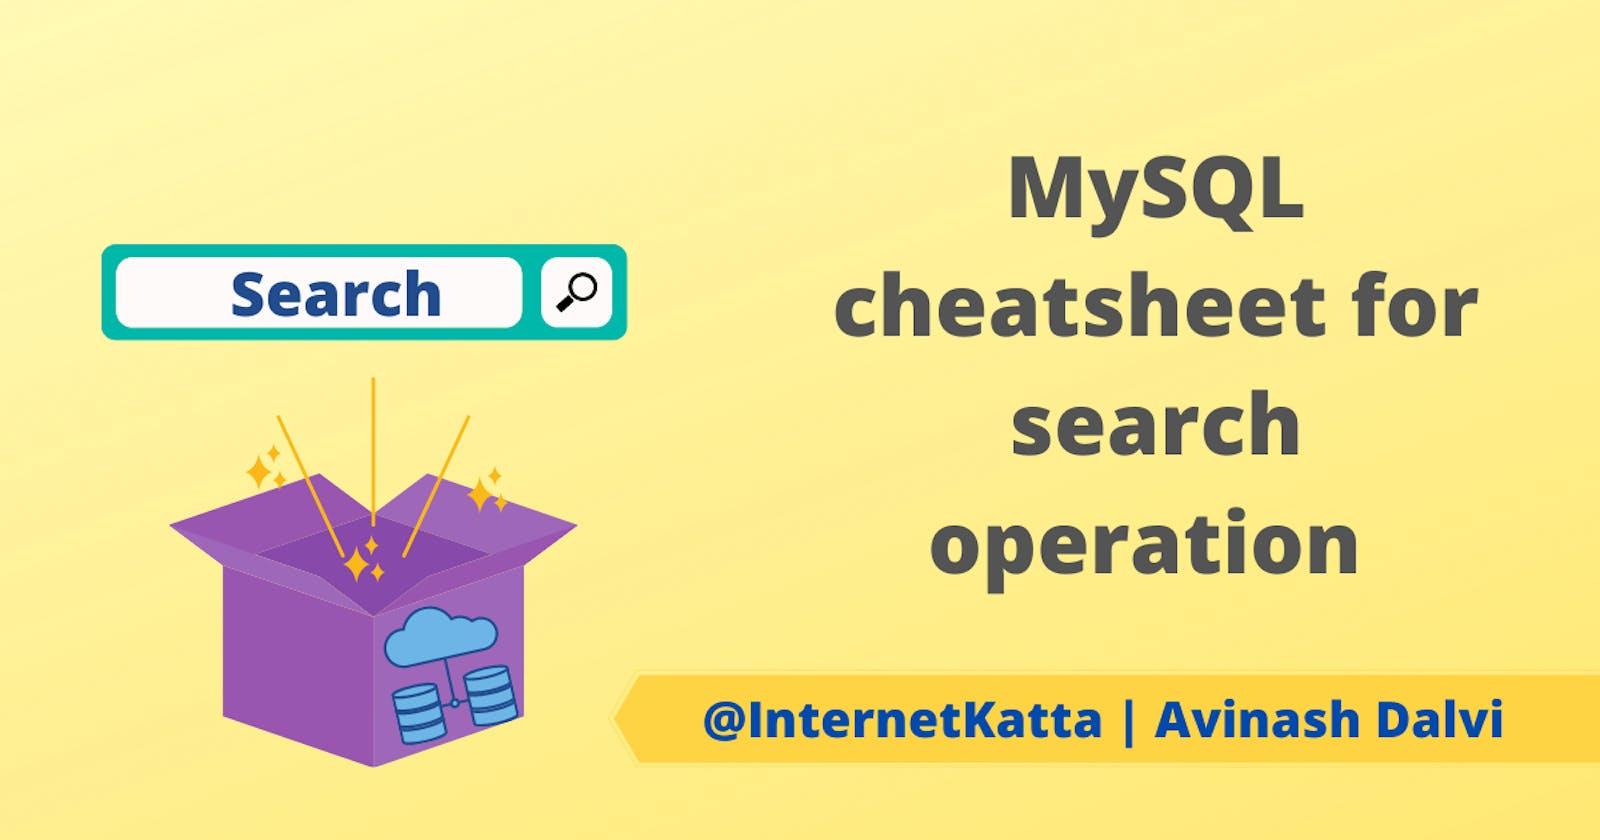 MySQL cheatsheet for search operation